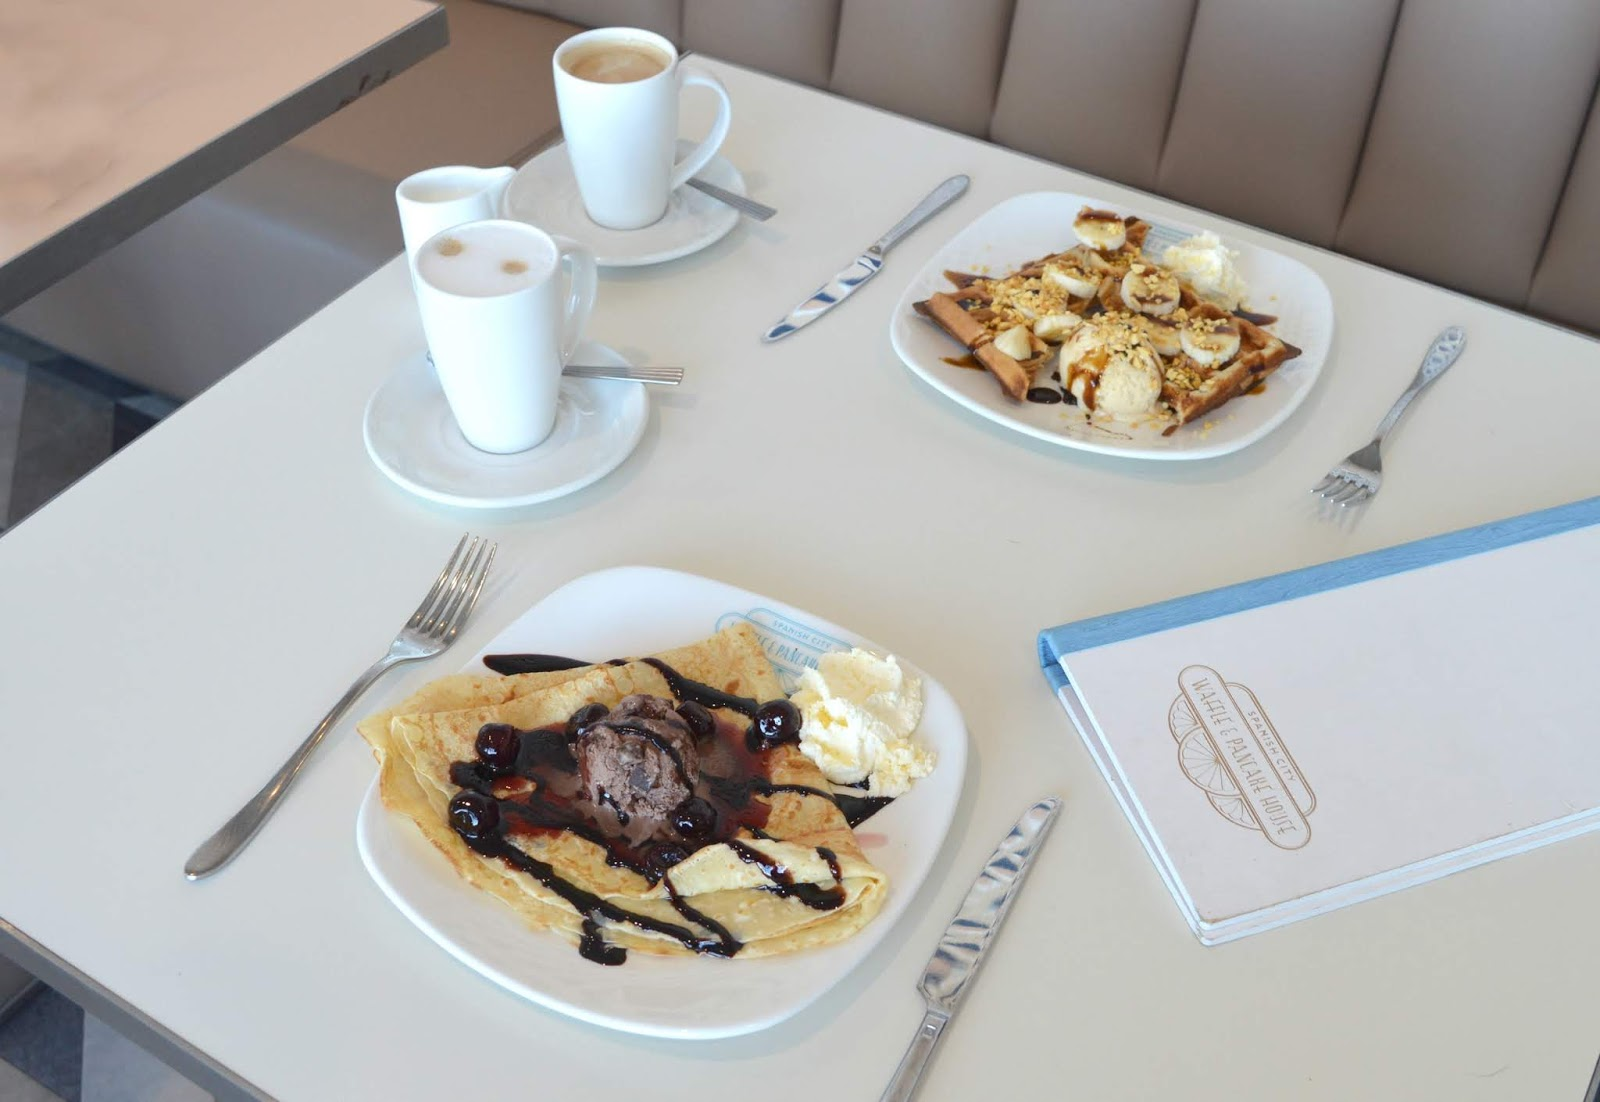 The Waffle and Pancake House, Spanish City, Whitley Bay